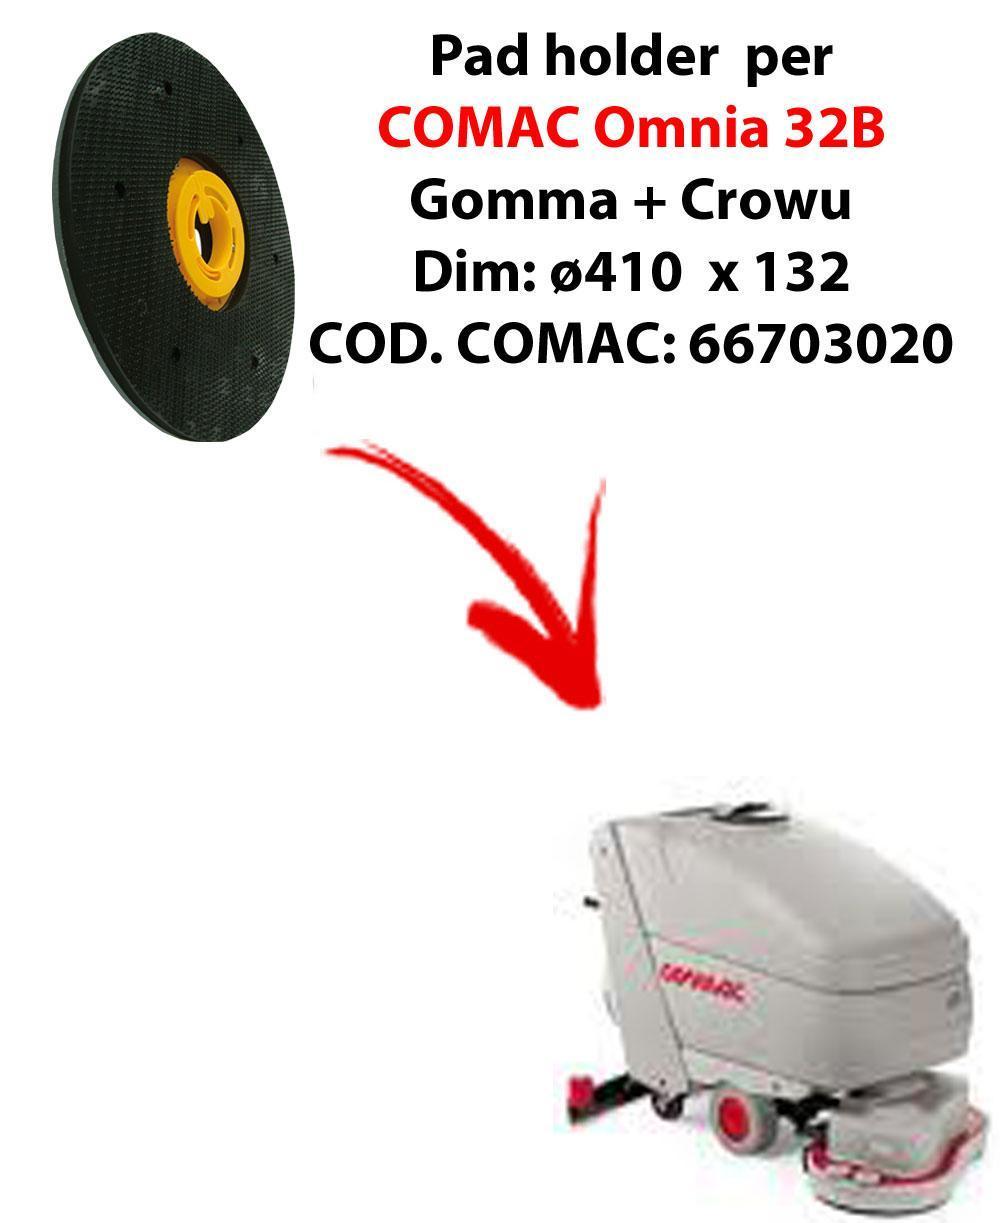 PAD HOLDER for scrubber dryer COMAC Omnia 32B. Code comac: 66703020